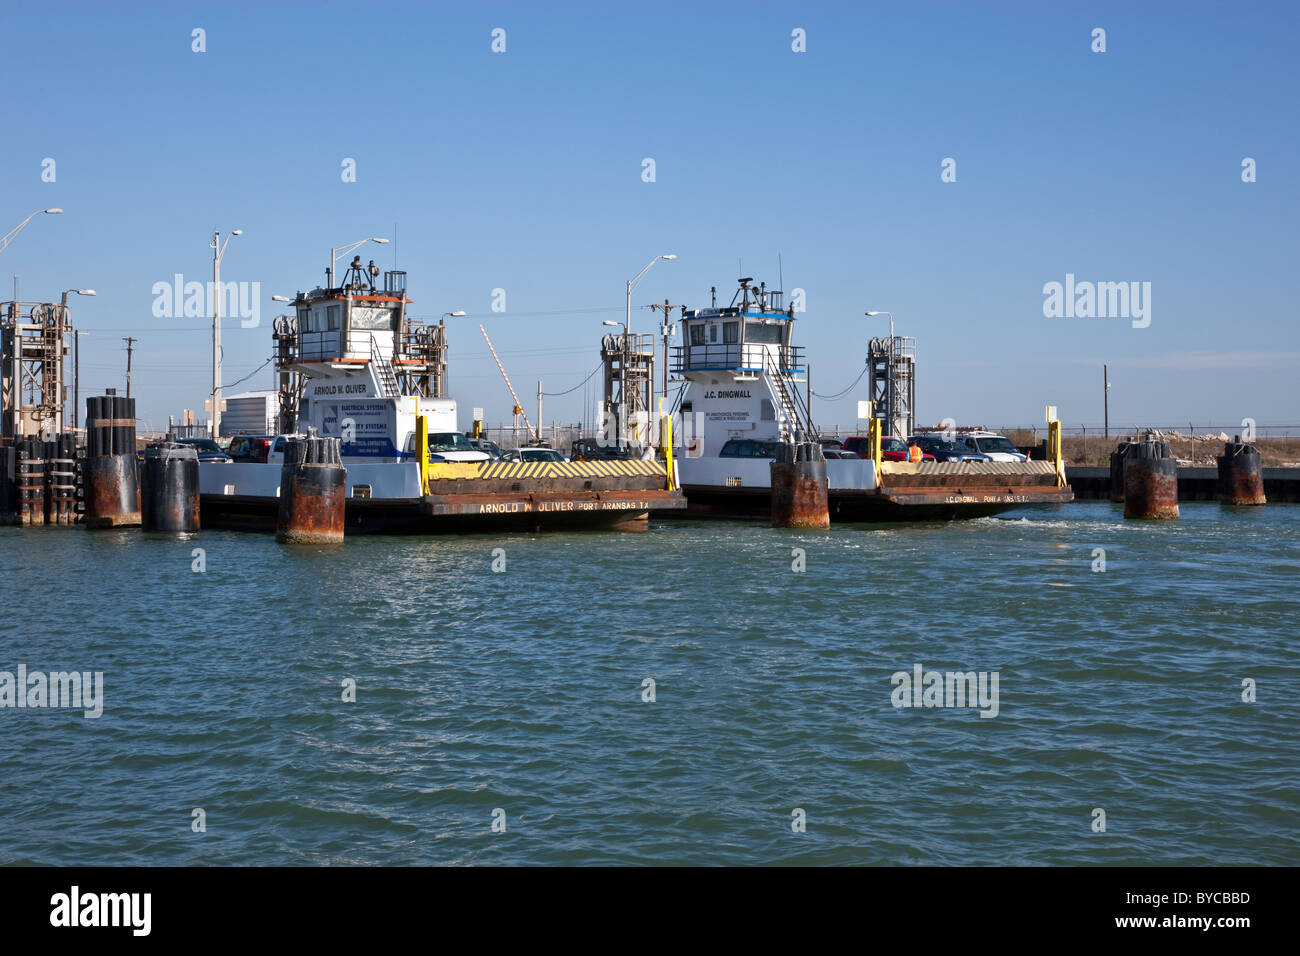 Ferries loading vehicles. - Stock Image